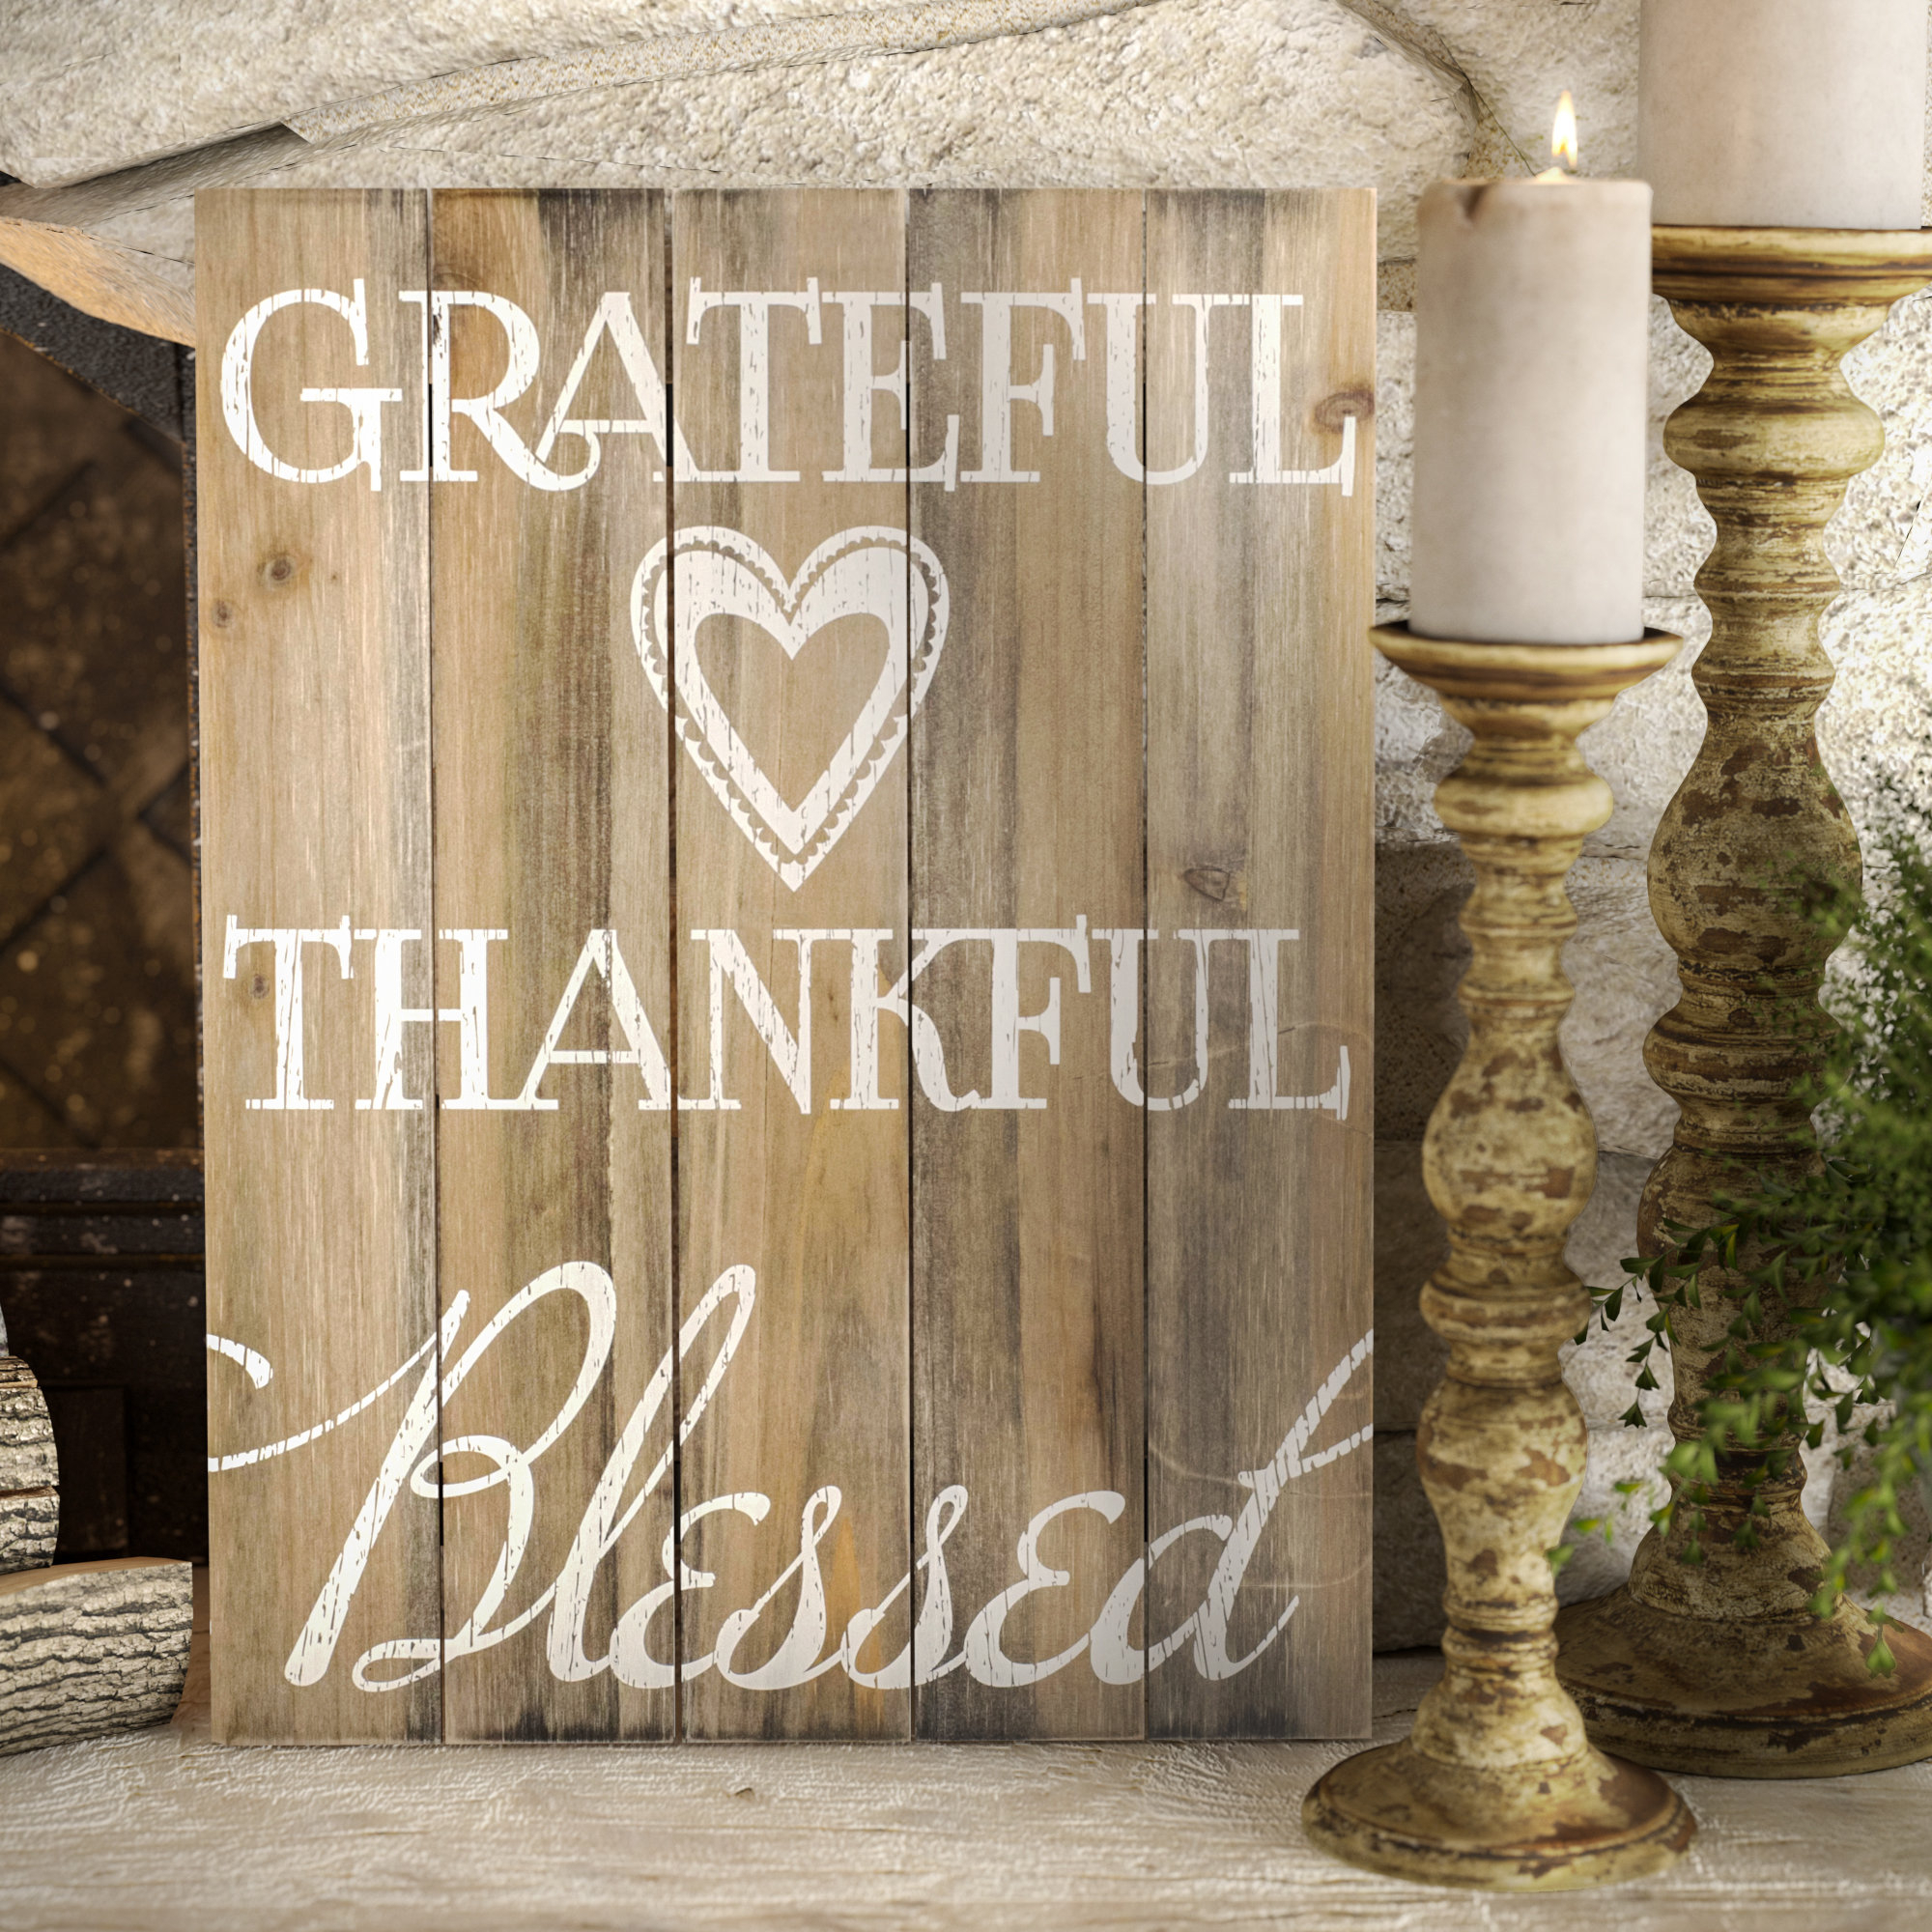 Thankful Wall Decor | Wayfair With Regard To Fawcett Thankful Heart Wall Decor (View 6 of 30)